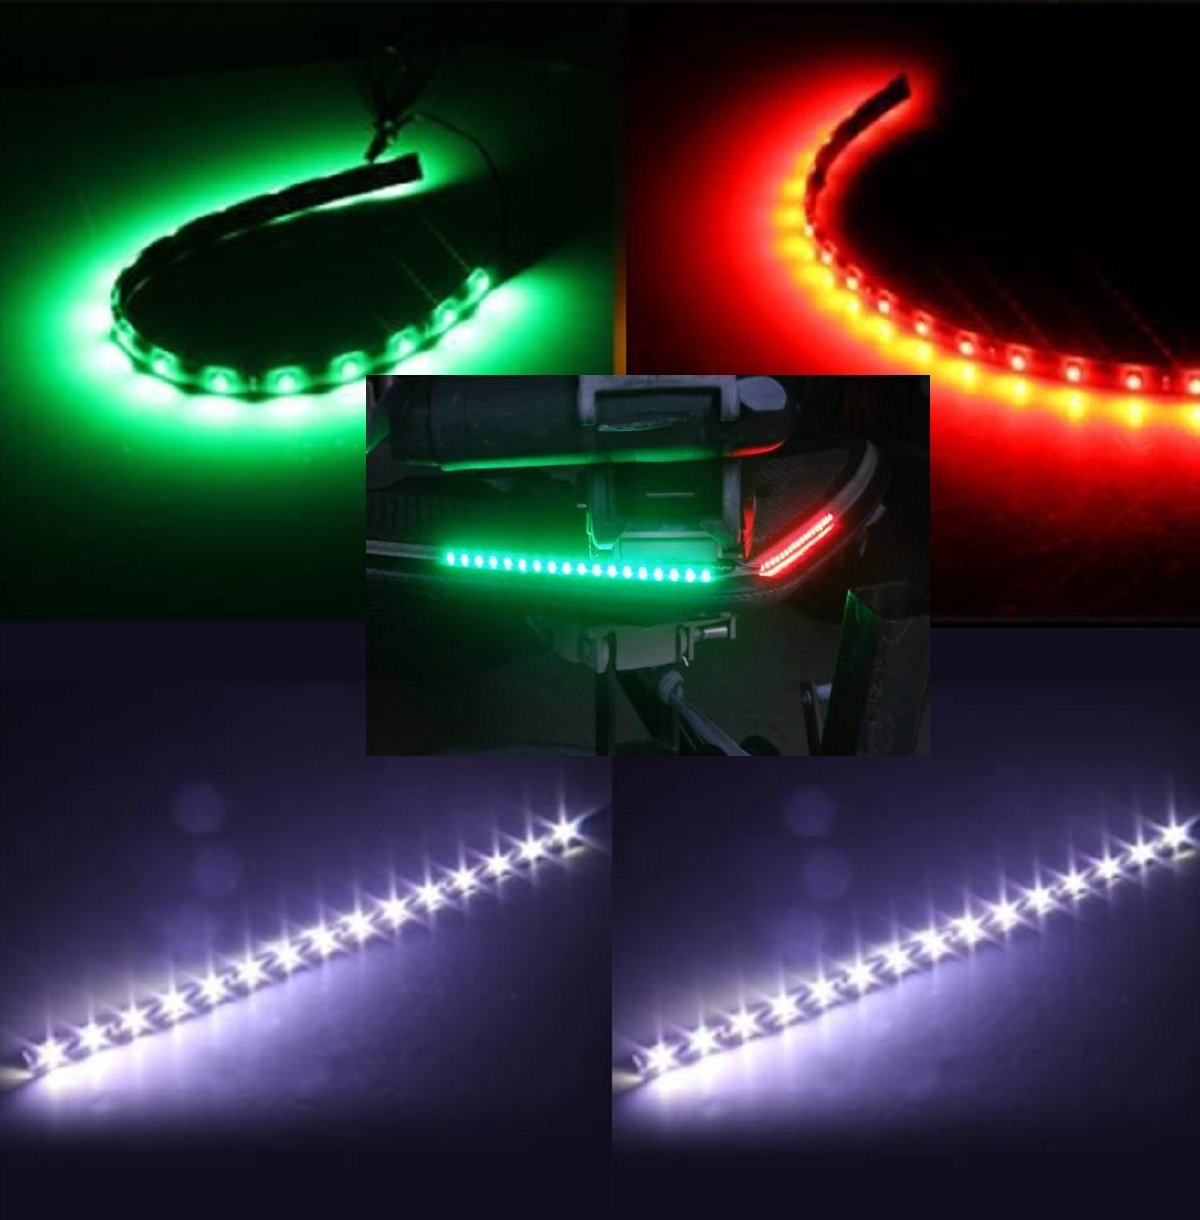 Boat Bow LED Navigation (STERN & BOW) Light Kit, Red, Green, and White Strips for Bass boats, Pontoon, Ski, Canoes, Kayaks, Triton, Ranger, BassCat, Nitro, Tracker Marine, Legend, Skeeter, Sun Tracker, Waterproof